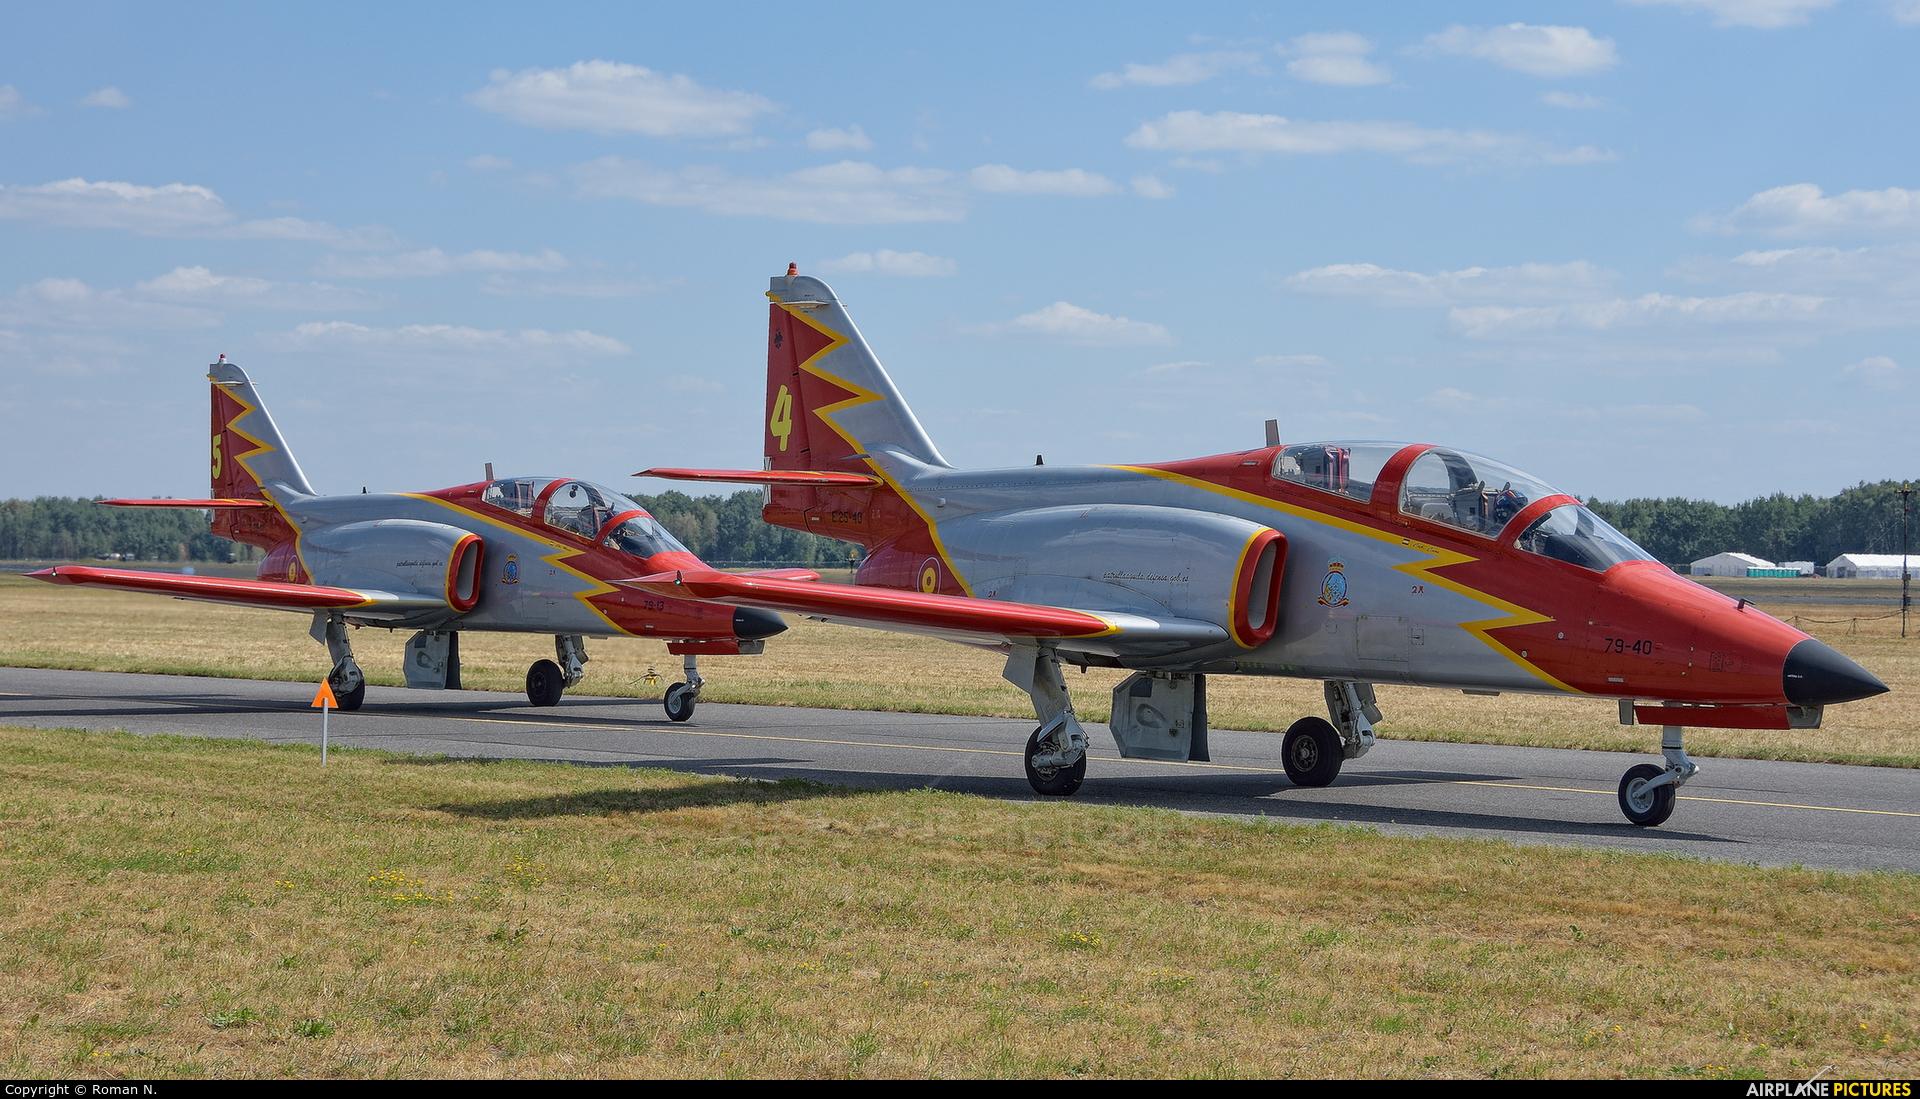 Spain - Air Force : Patrulla Aguila E.25-40 aircraft at Radom - Sadków